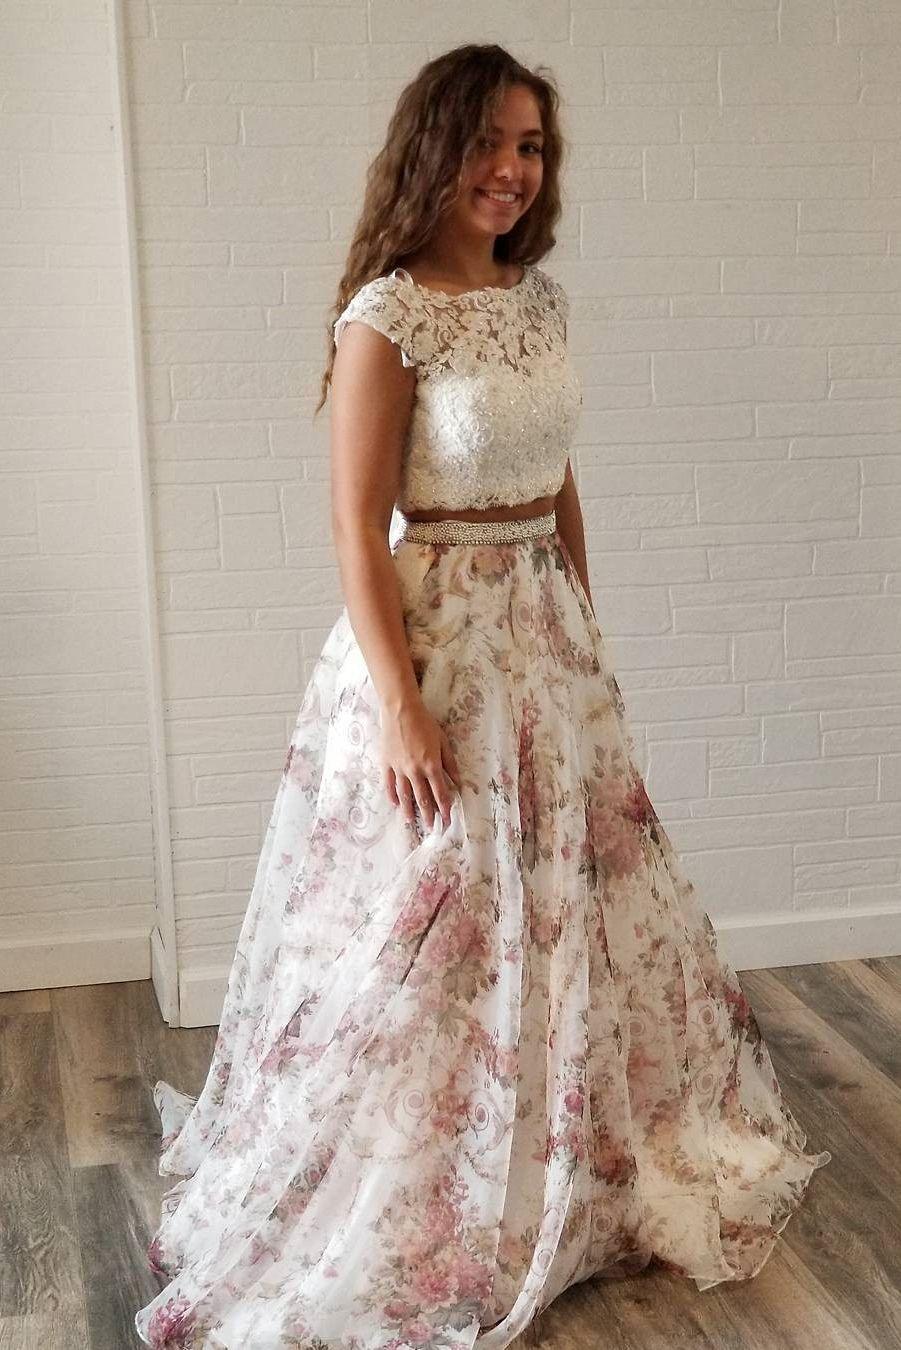 Unique two piece white lace and floral print long party dress